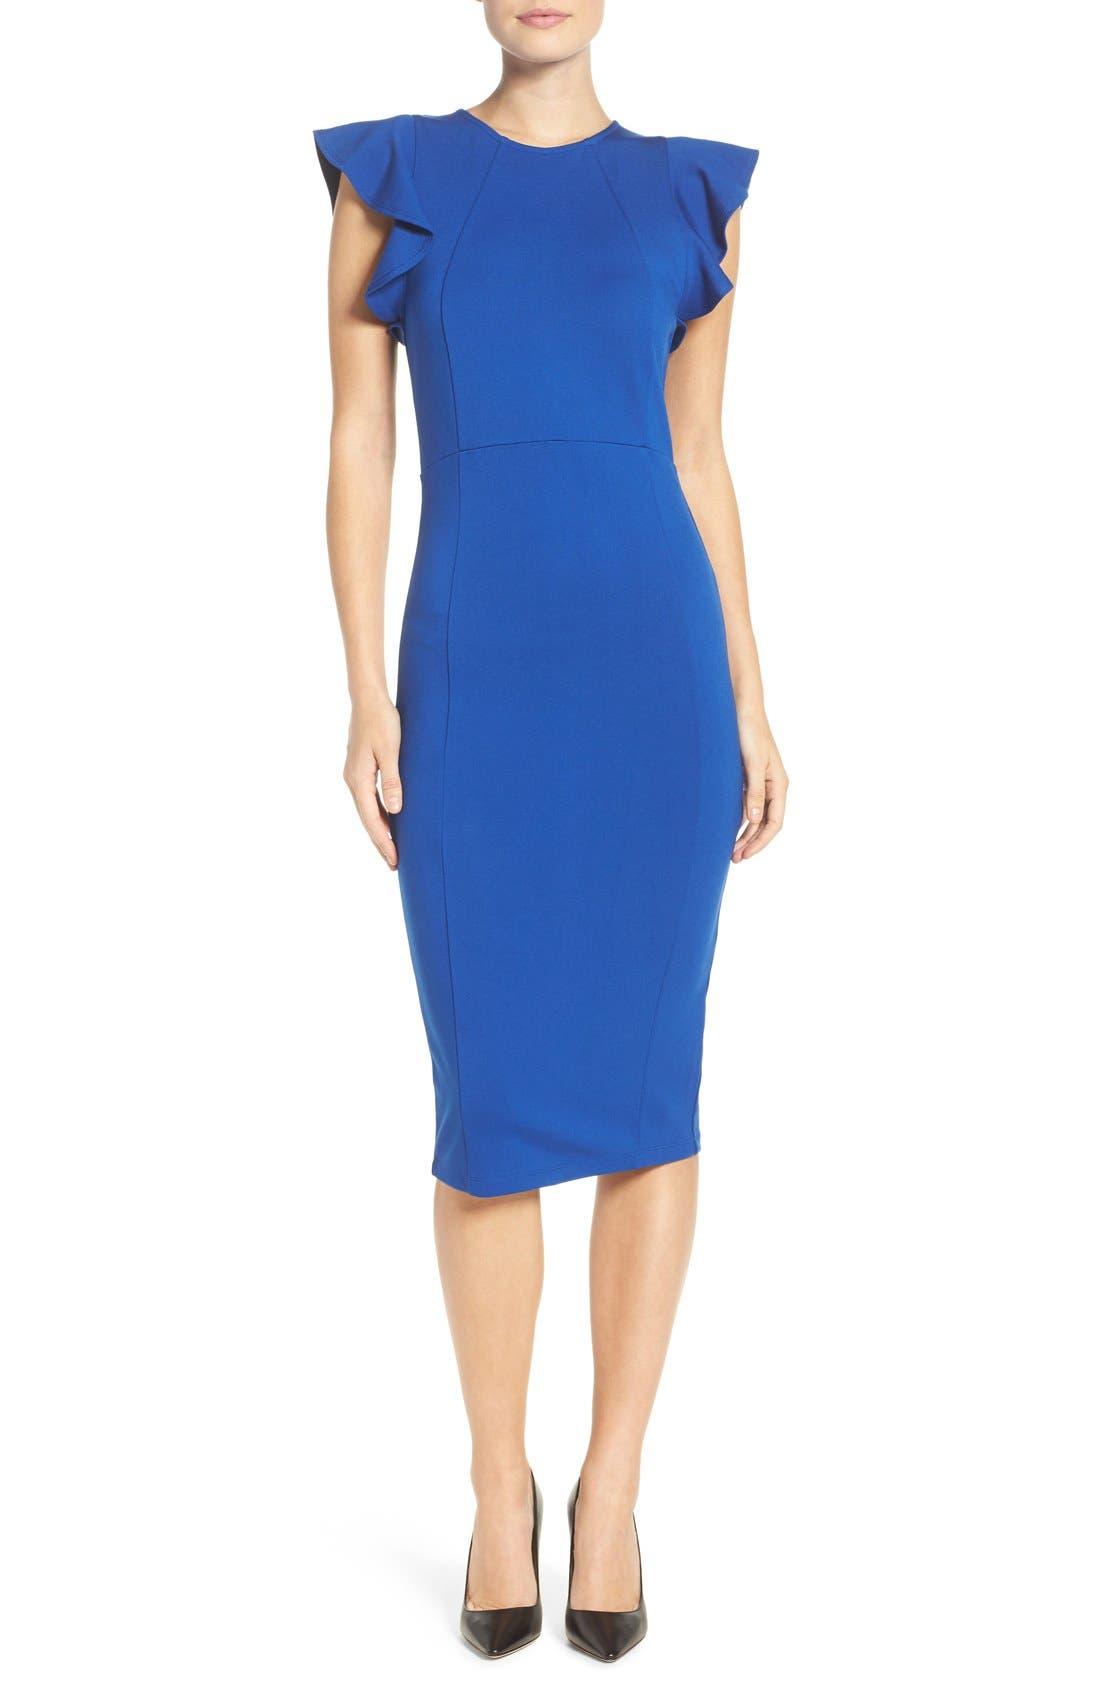 Blue dress cocktail quilt